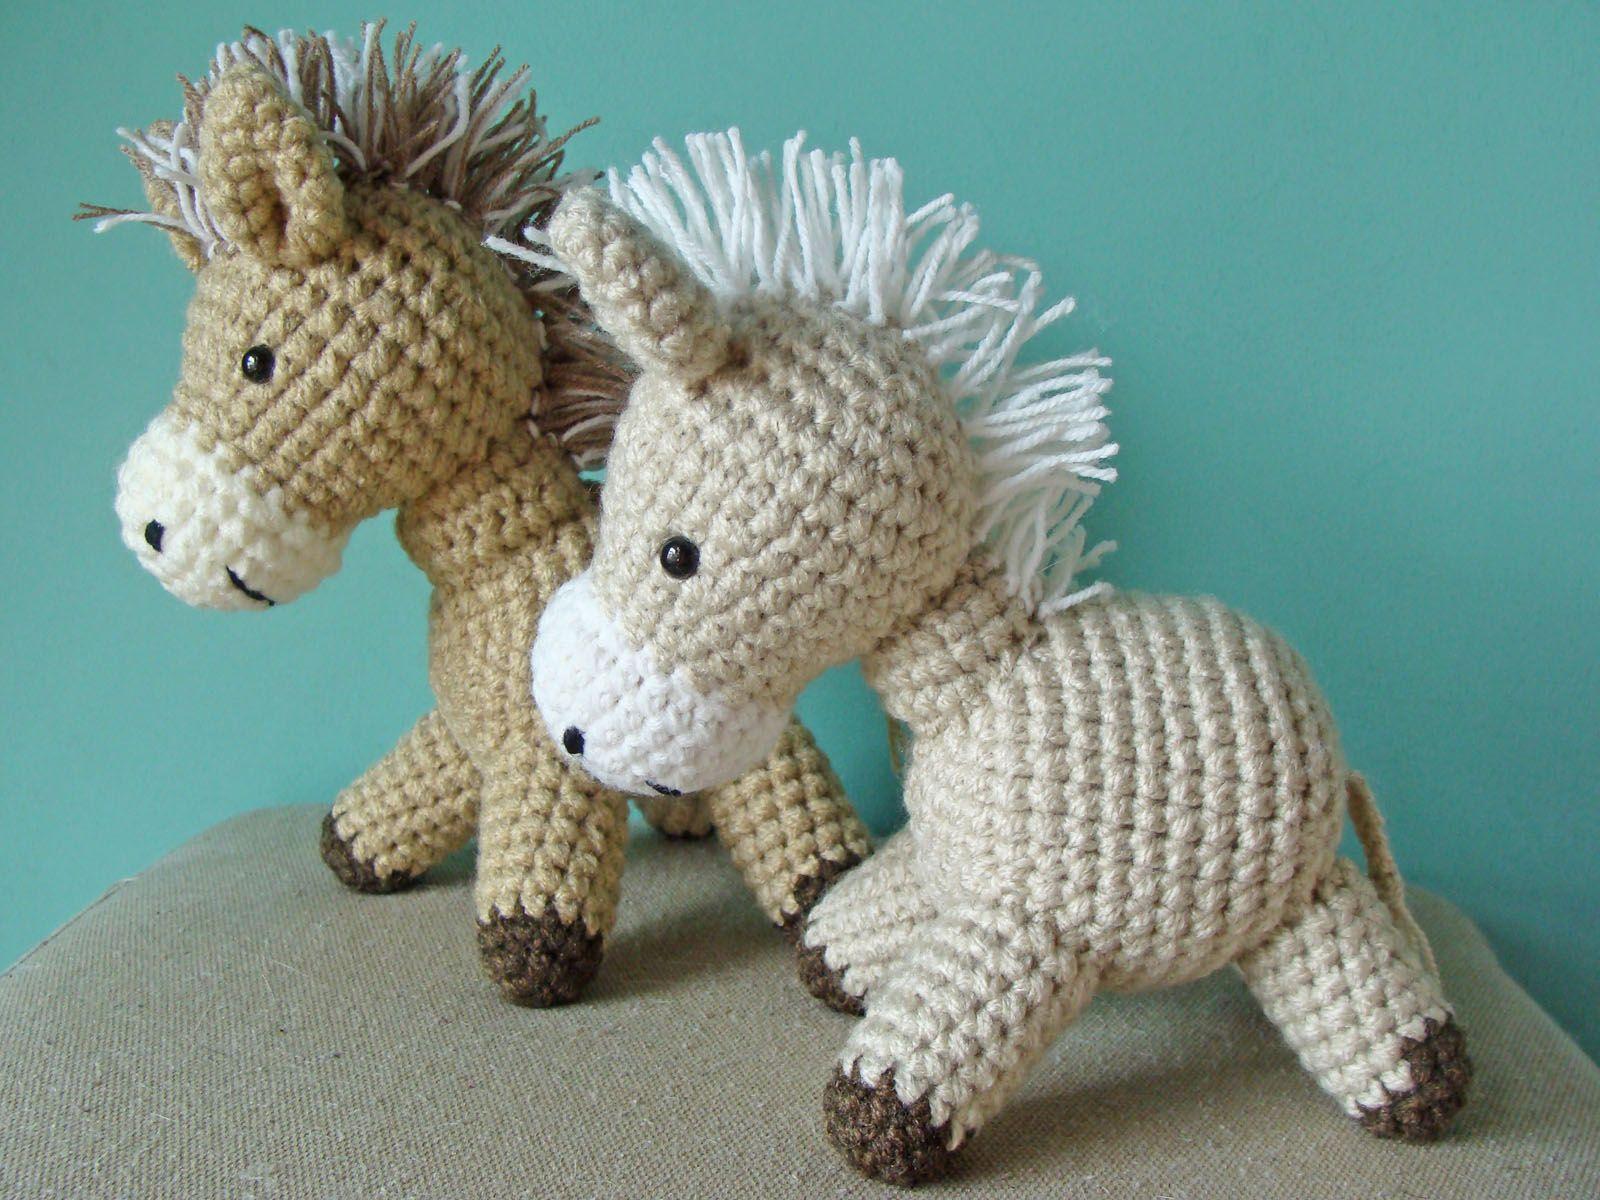 Amigurumis Caballitos A Crochet : Caballitos tejidos al crochet amigurumi amigurumi